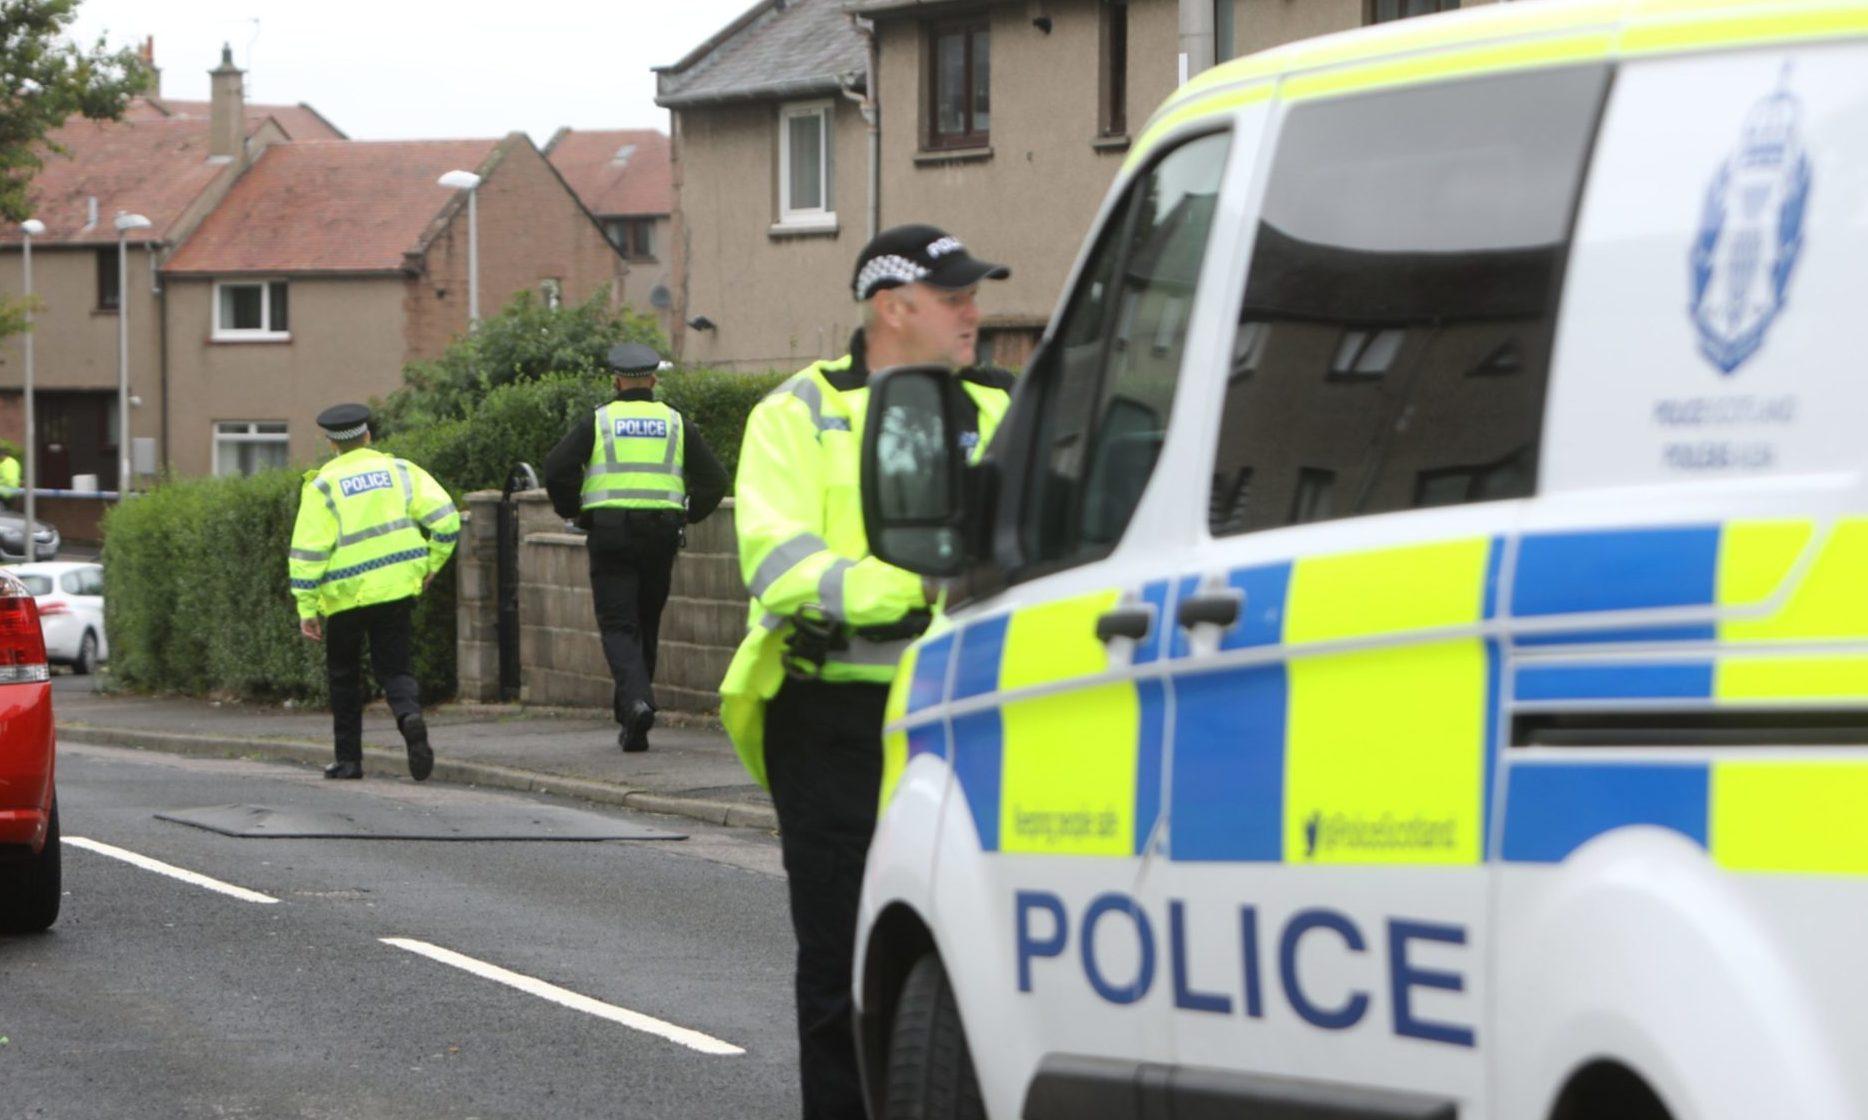 Police at the scene in Arbroath.